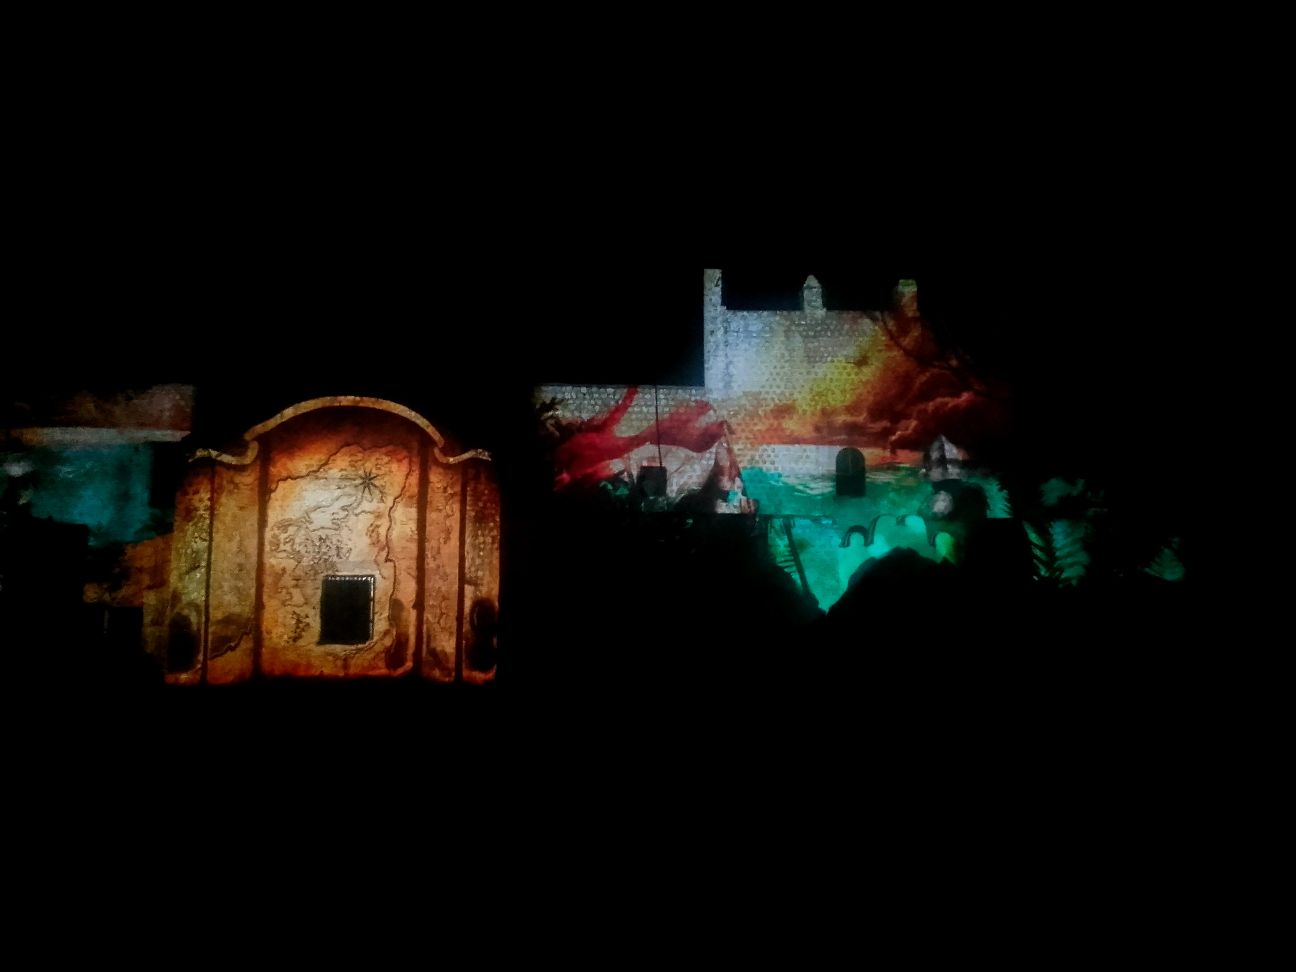 Lichtspektakel Convention San Bernardo, Valladolid